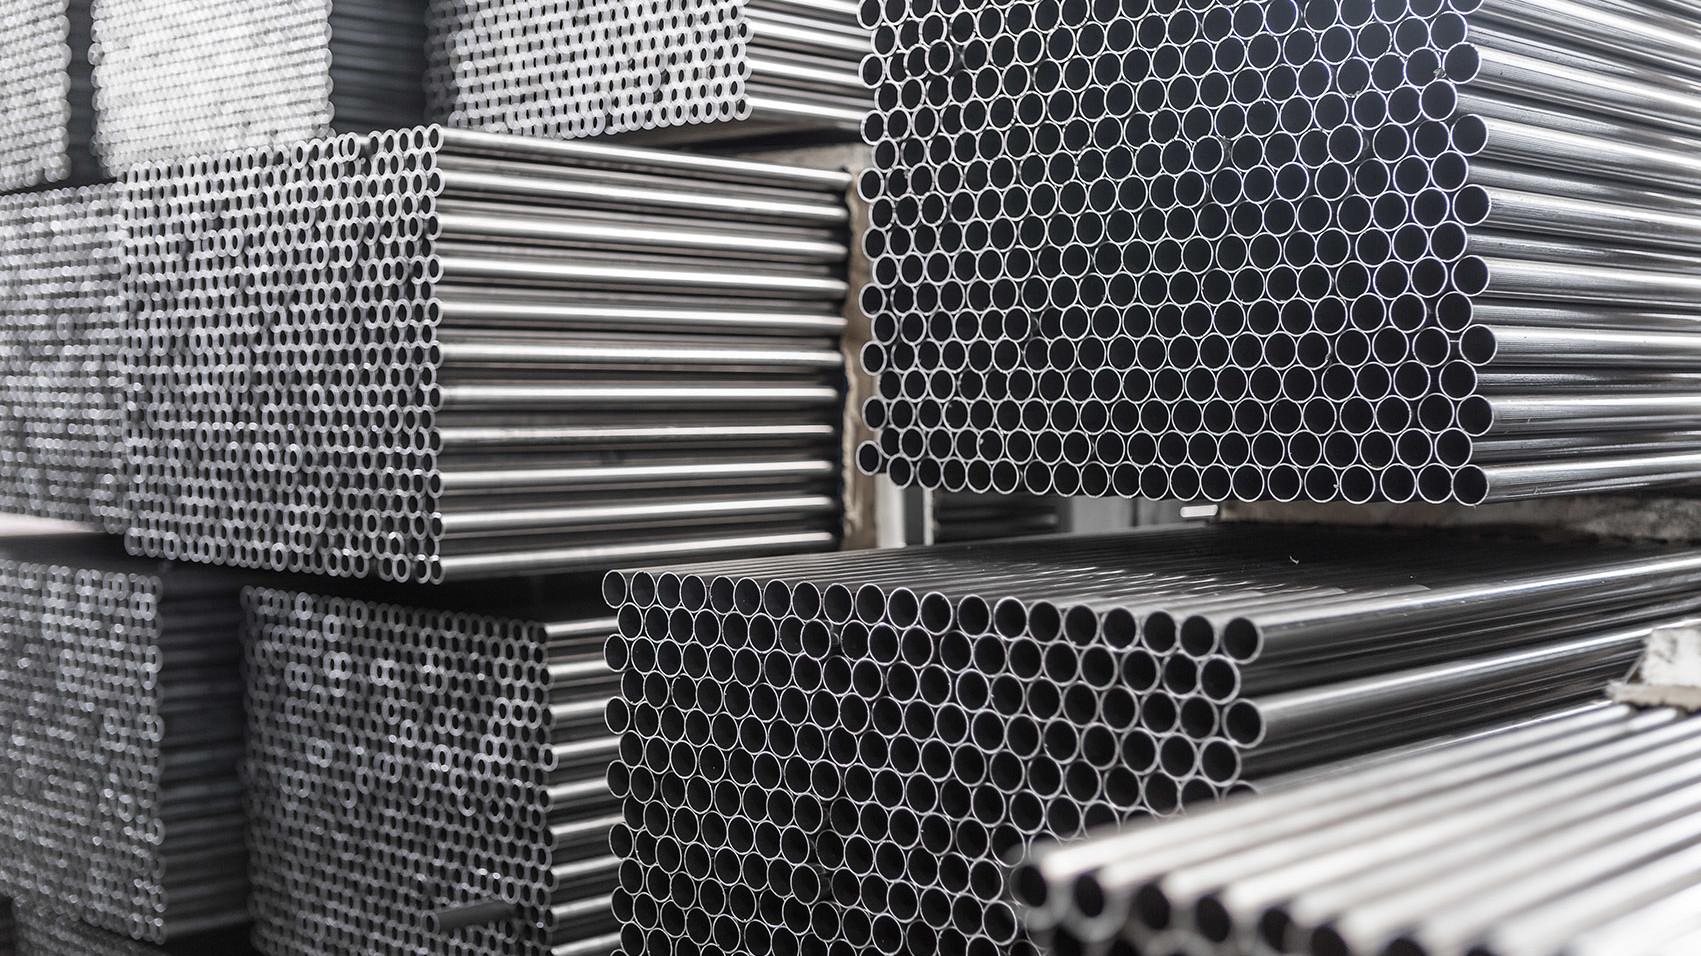 welded-tubes-uai-1701x956